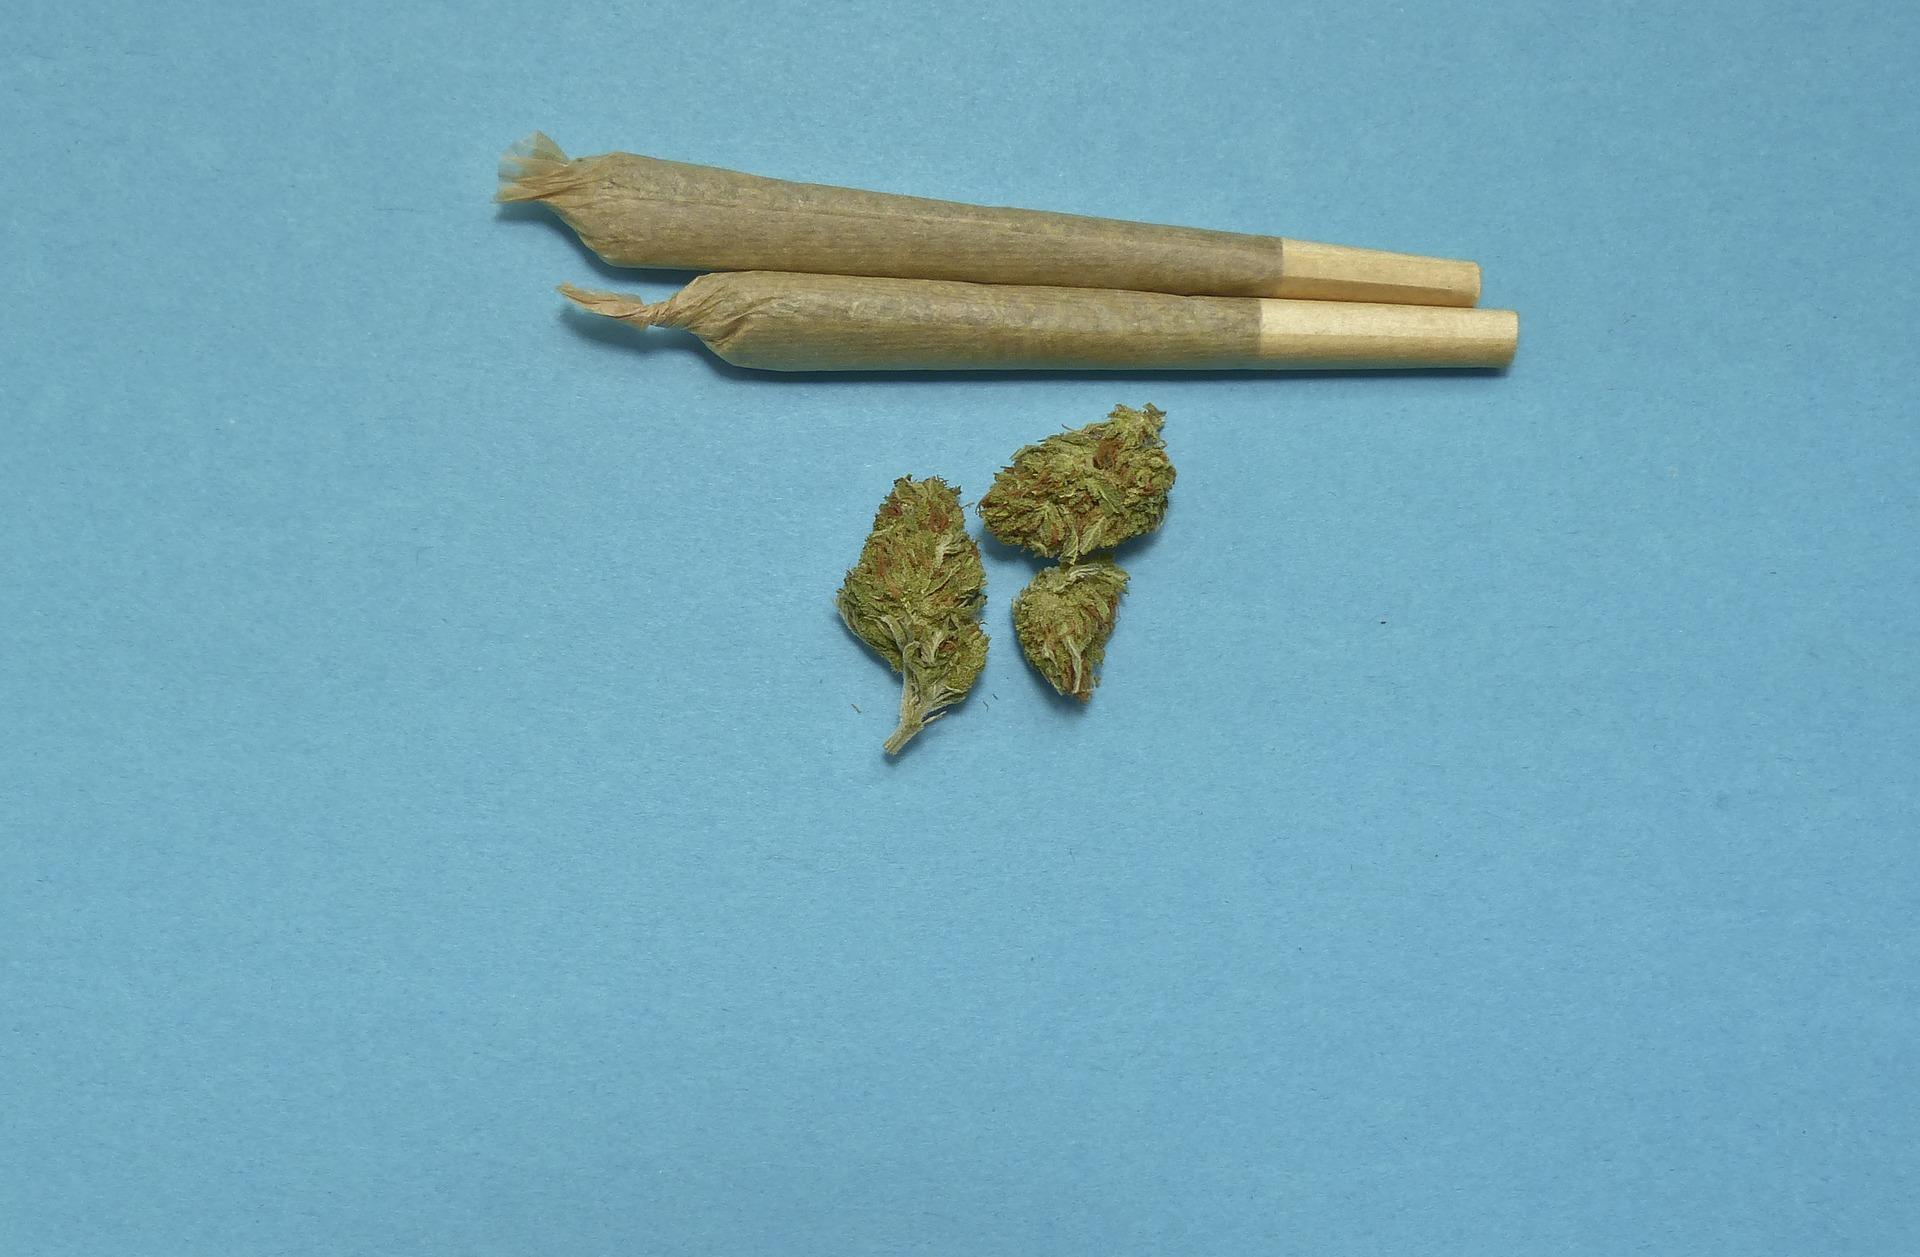 rolled up marijuana